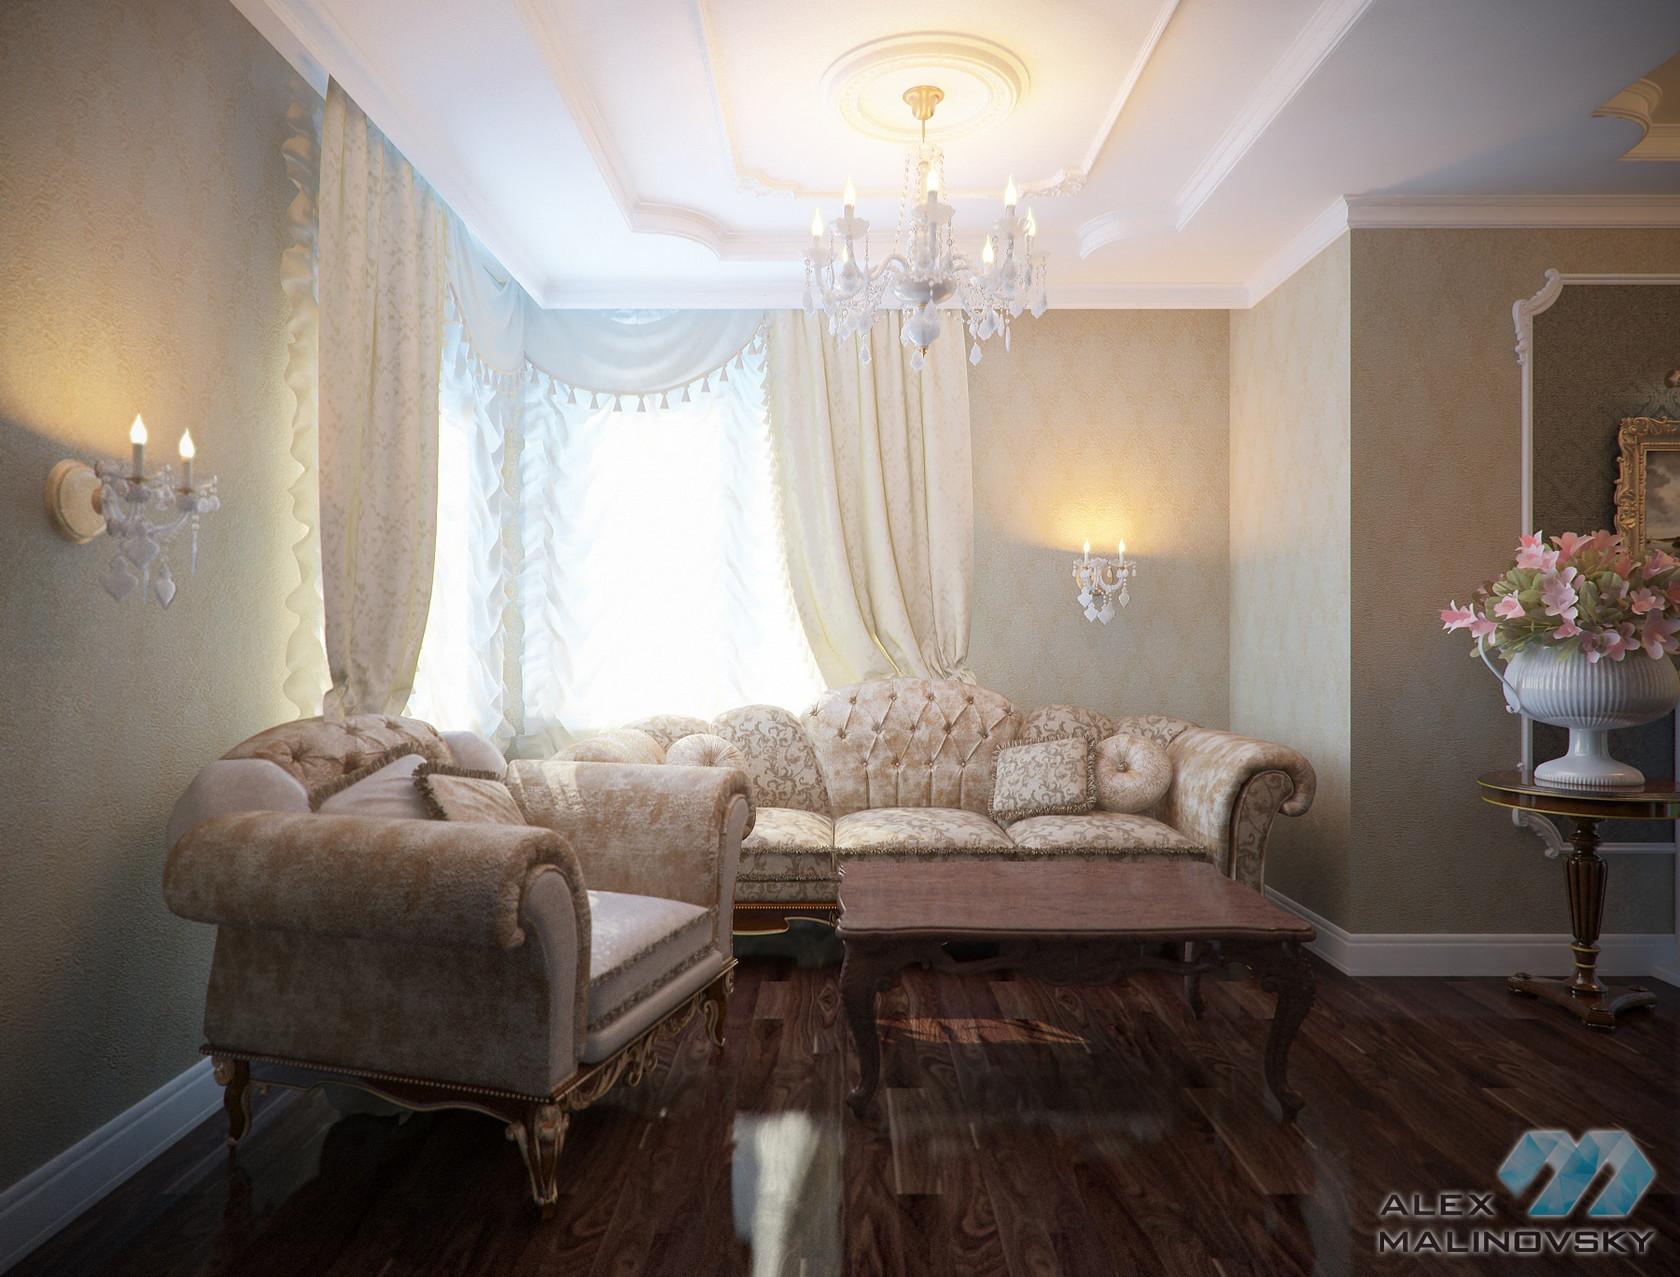 Гостиная, 3х комнатная квартира, ЖК Доминанта, СПб